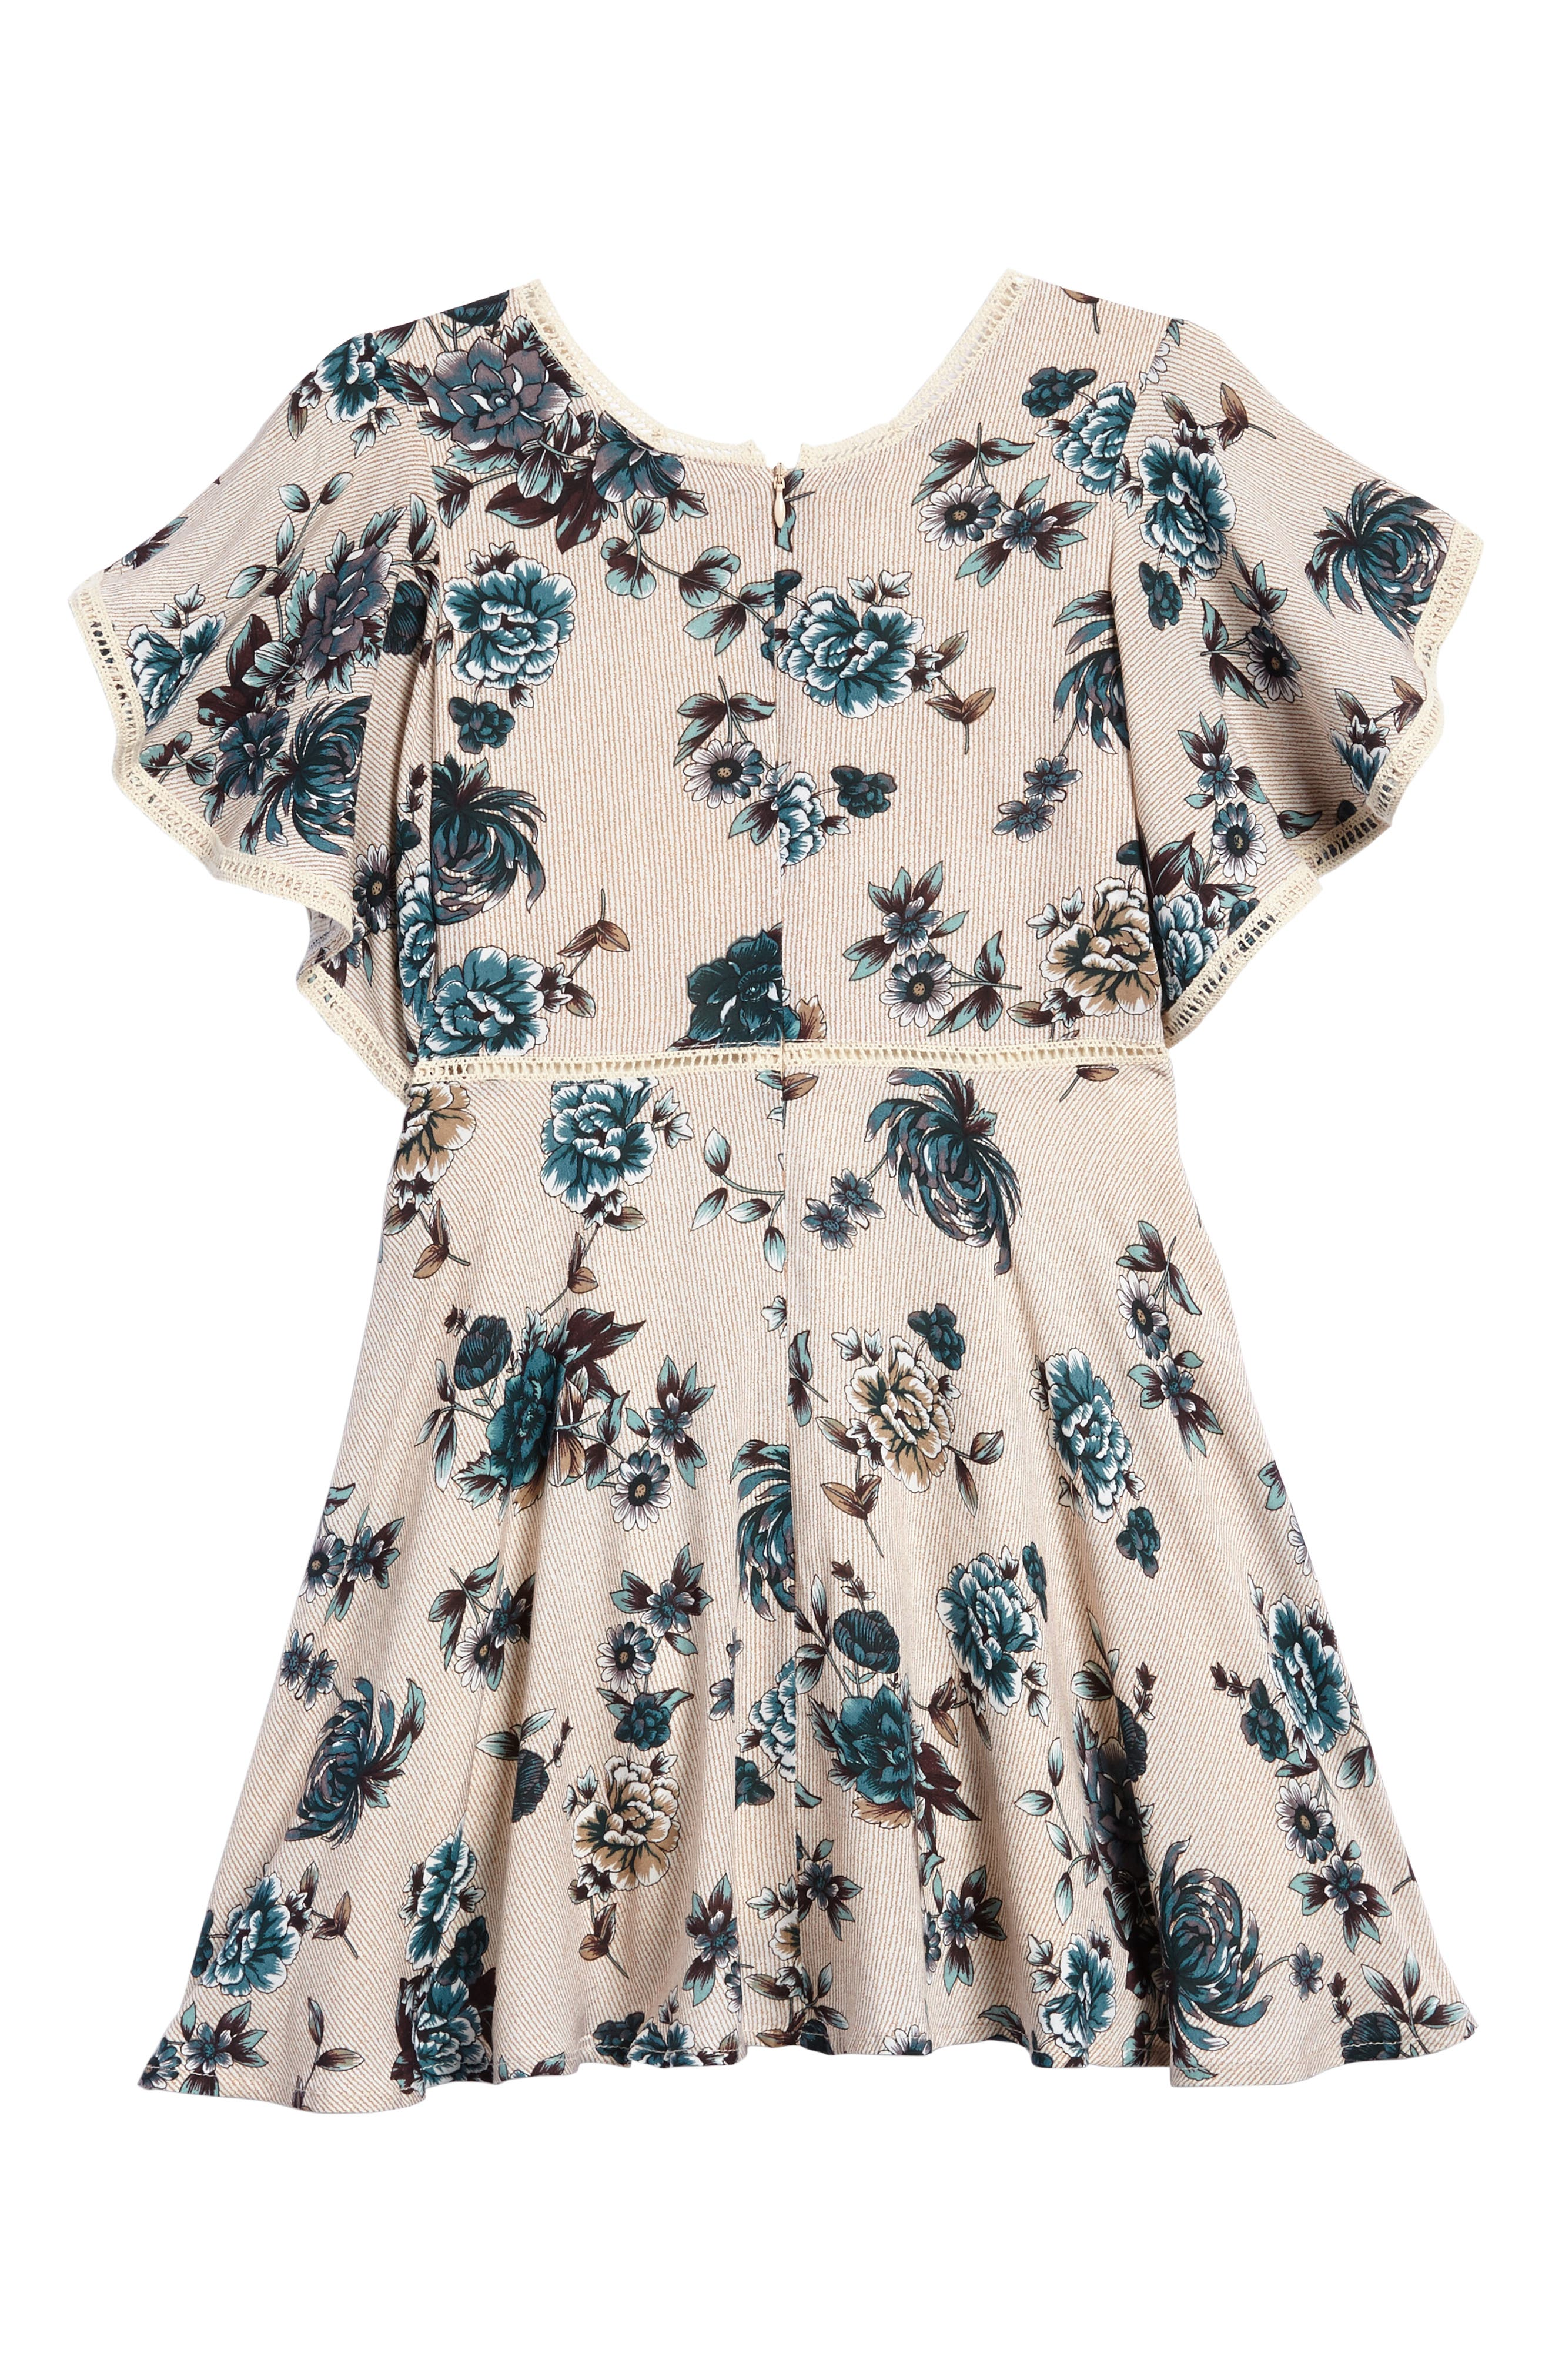 Floral Print Ruffle Sleeve Dress,                             Alternate thumbnail 2, color,                             250